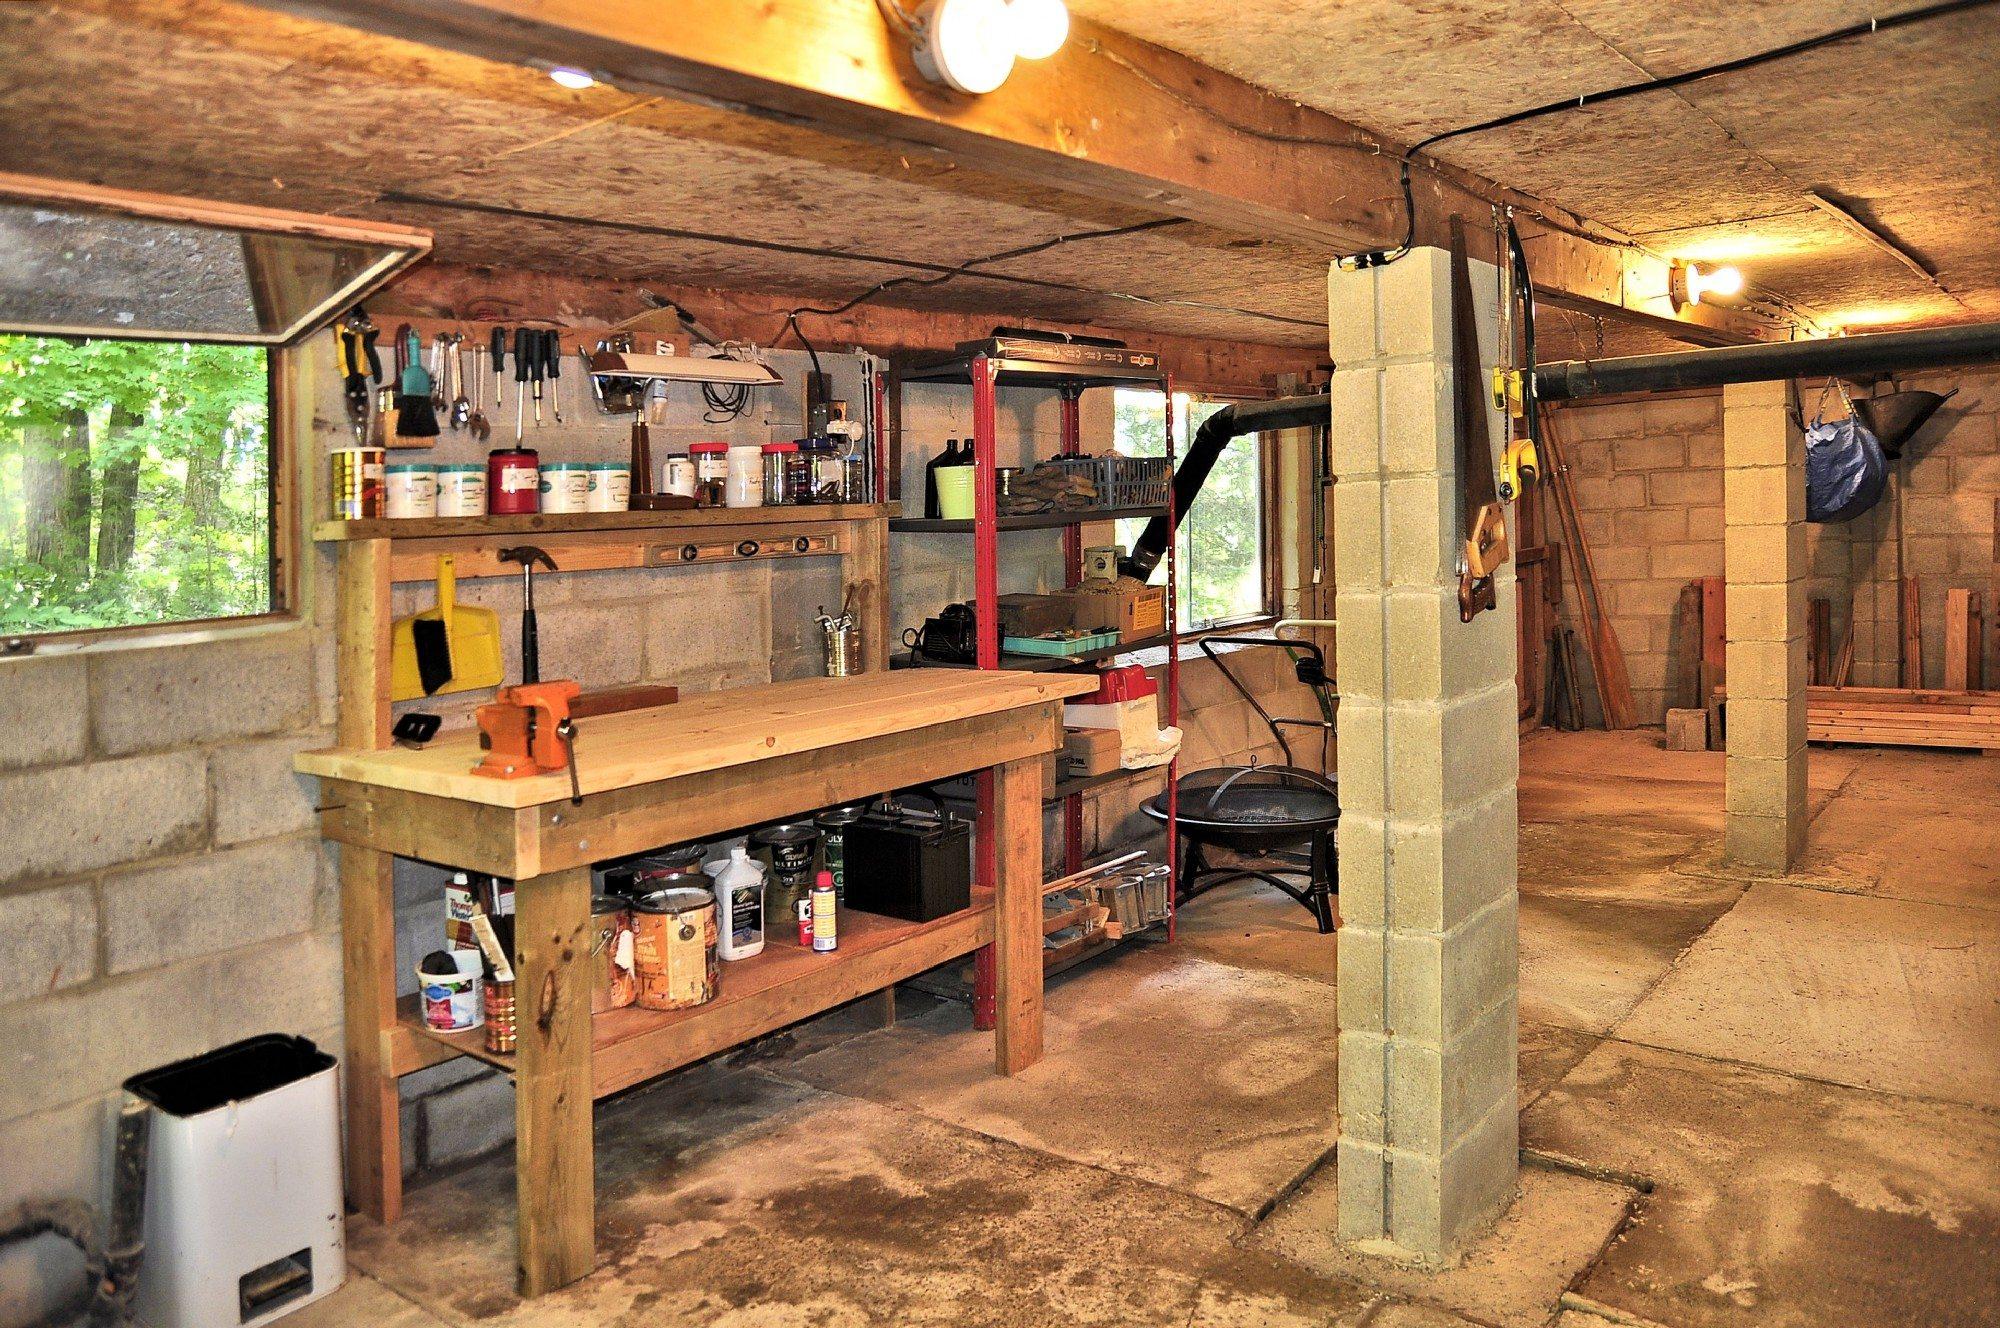 kawartha-lakes-cottage-for-sale-315-crego-lake-road-9